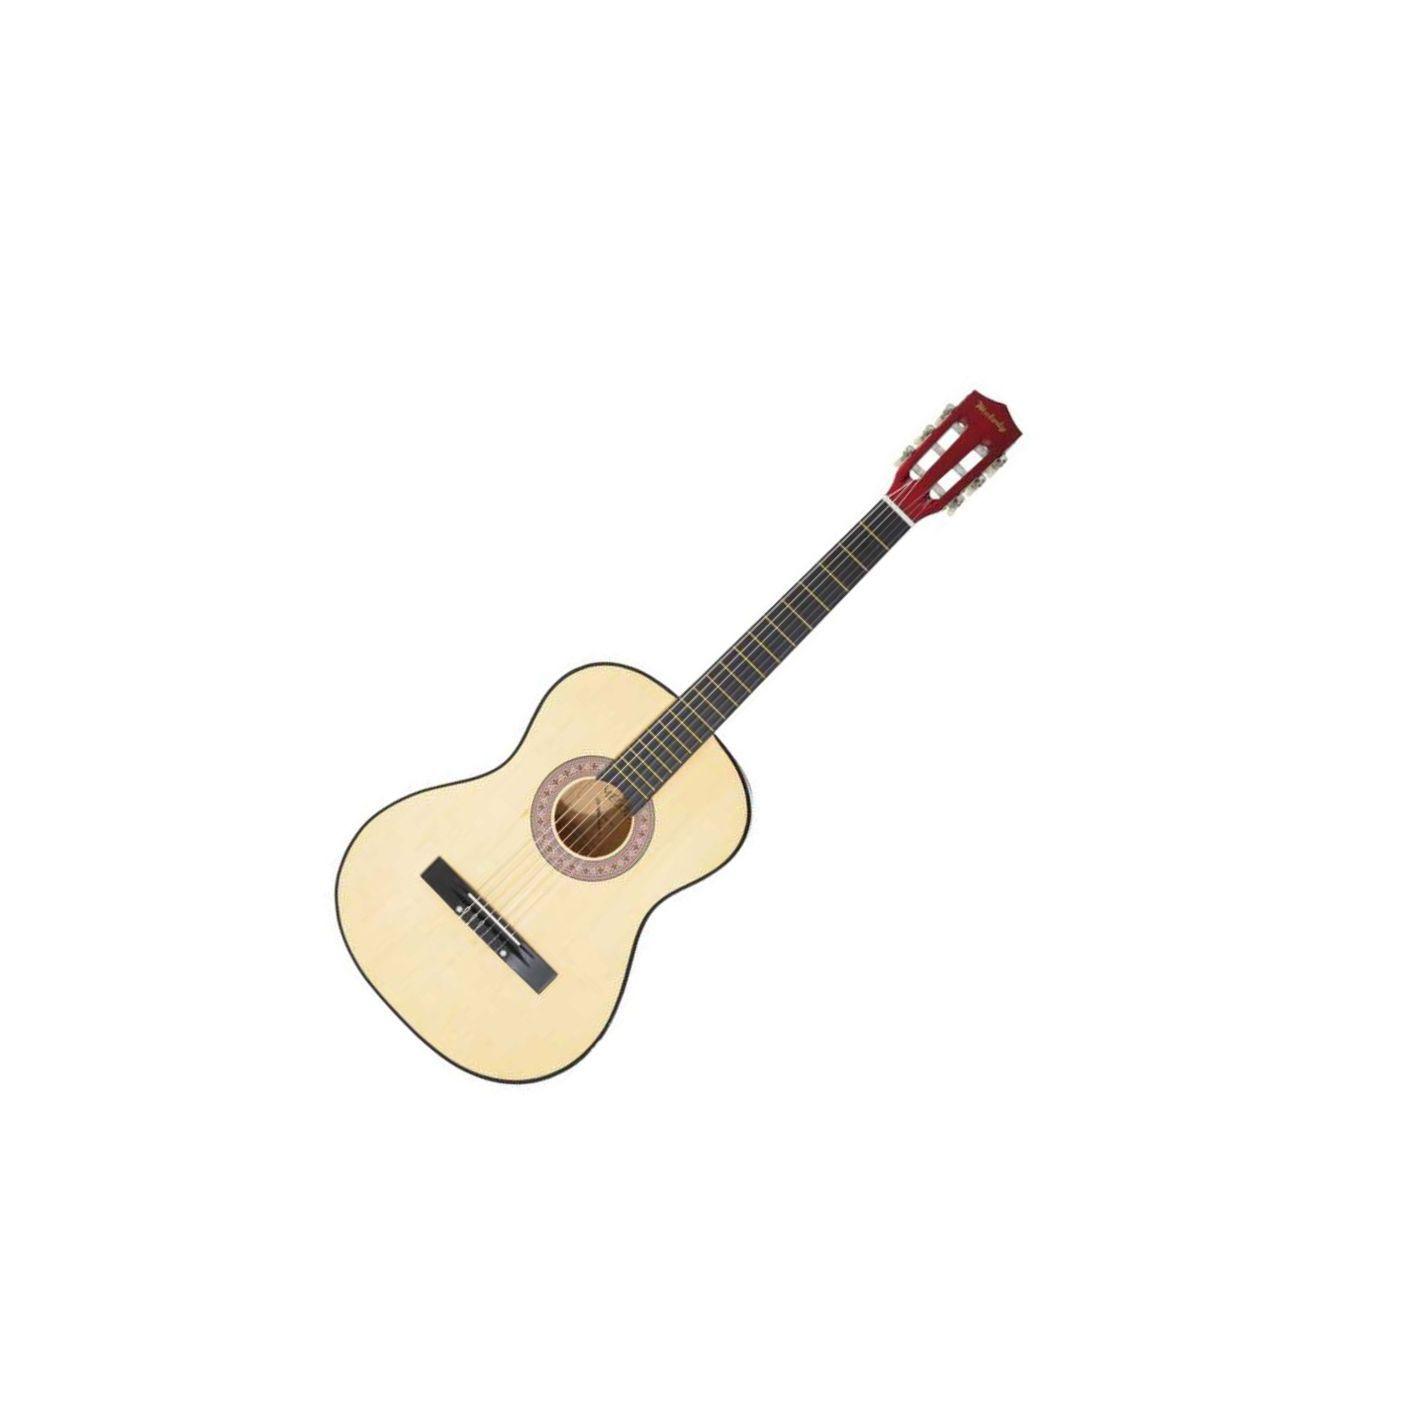 Violão Melody ASN1301 Nylon Clássico Acústico Natural